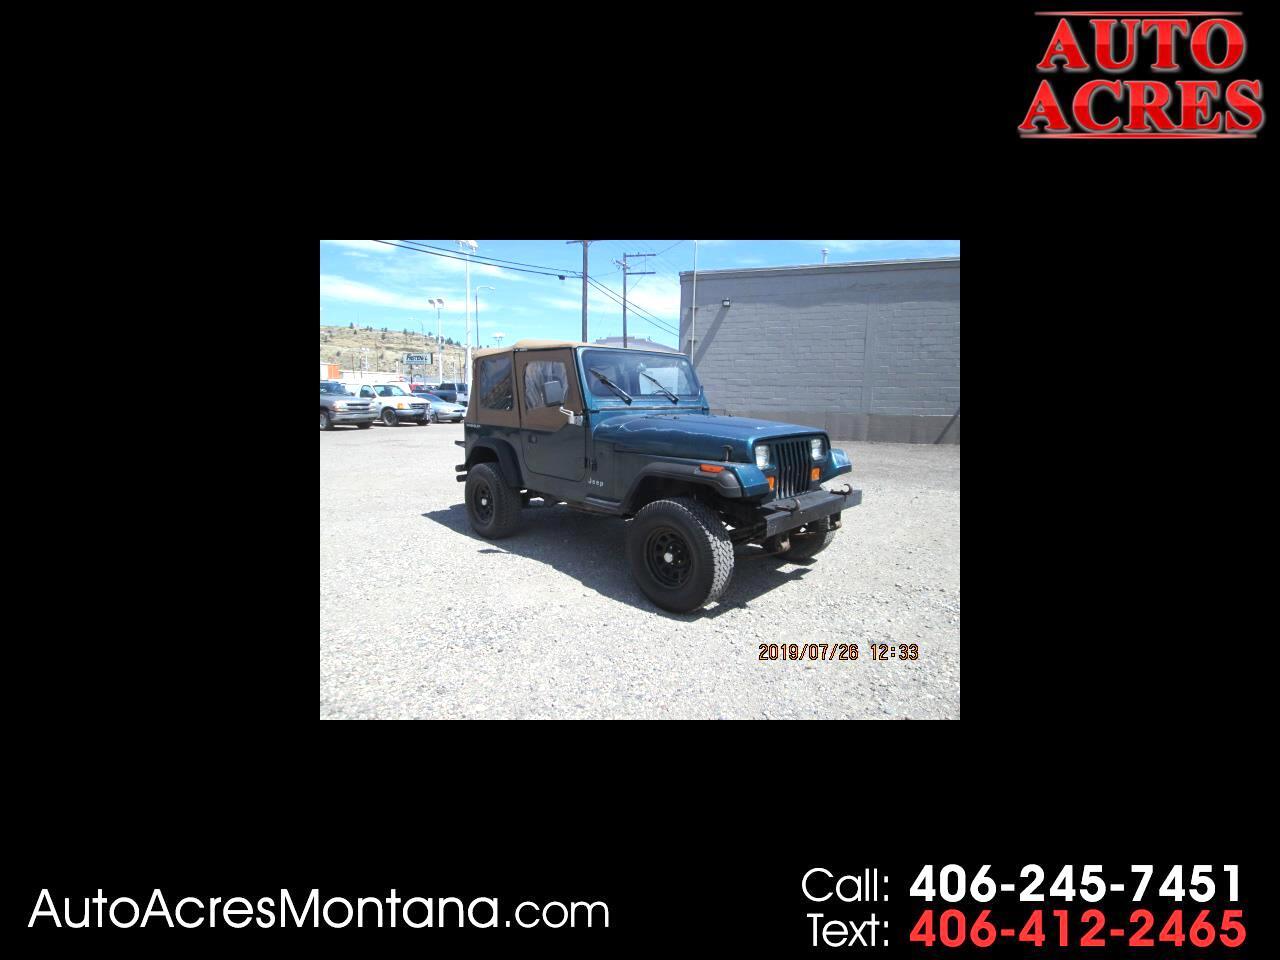 1995 Jeep Wrangler 2dr S